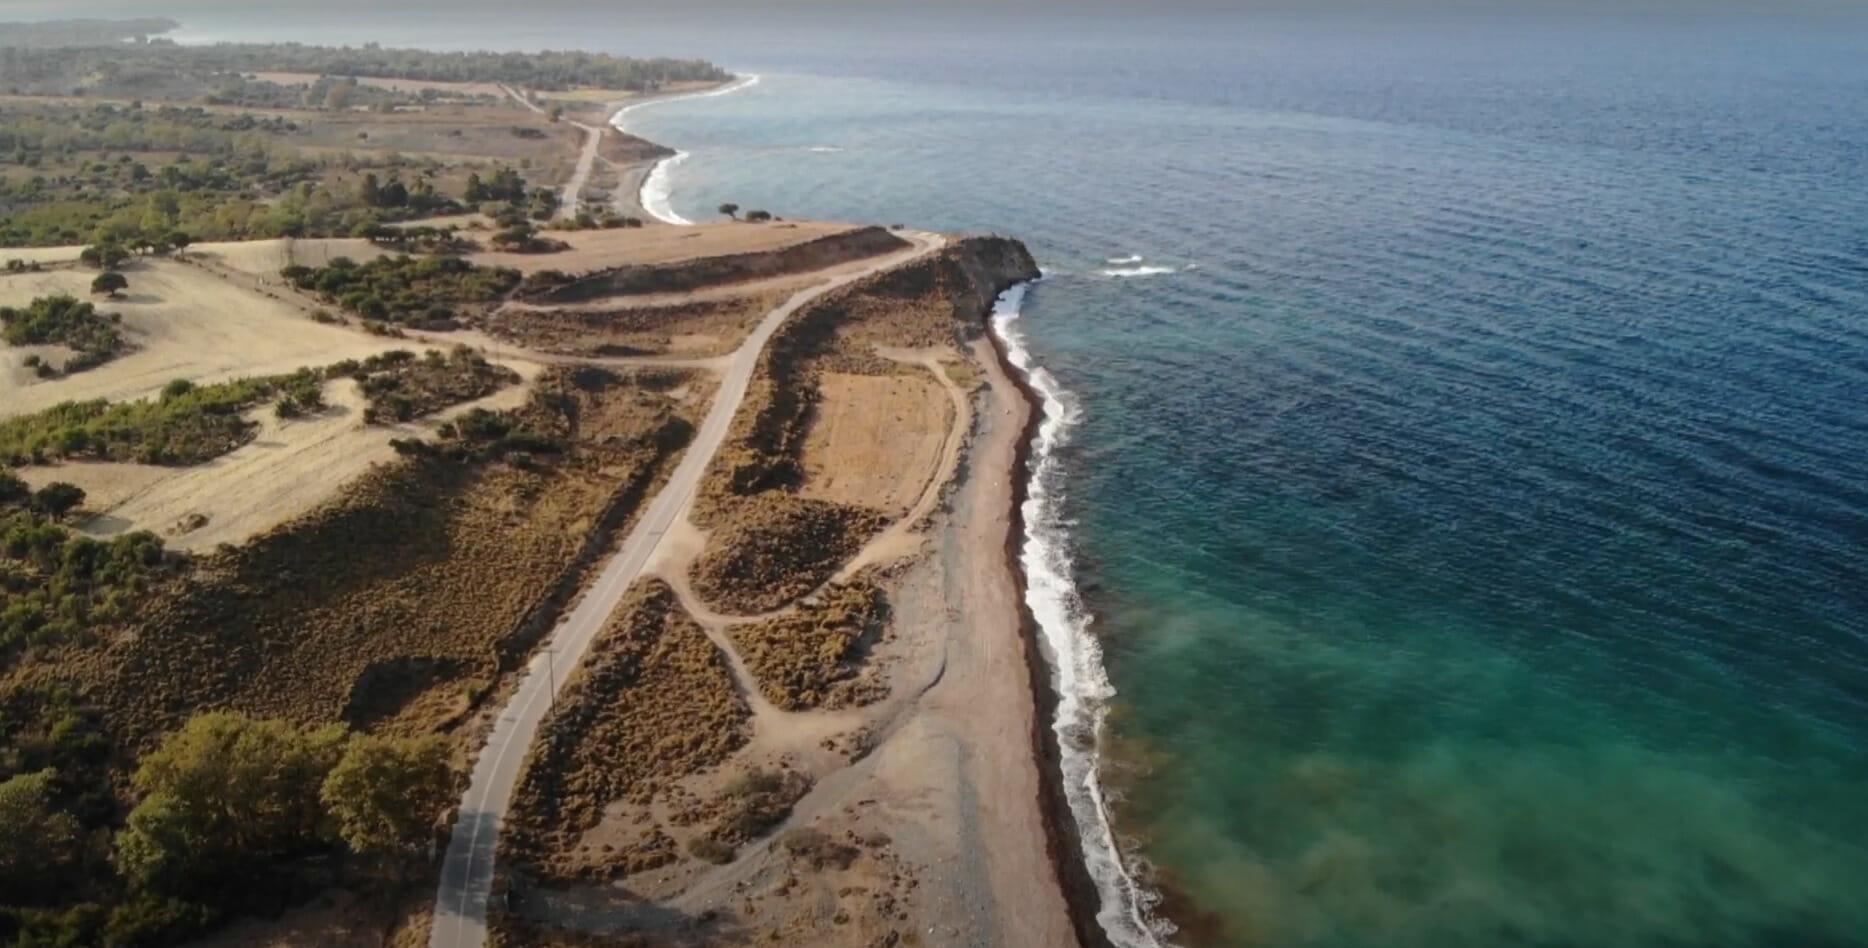 Video: Samothraki 2020 mit der Drohne